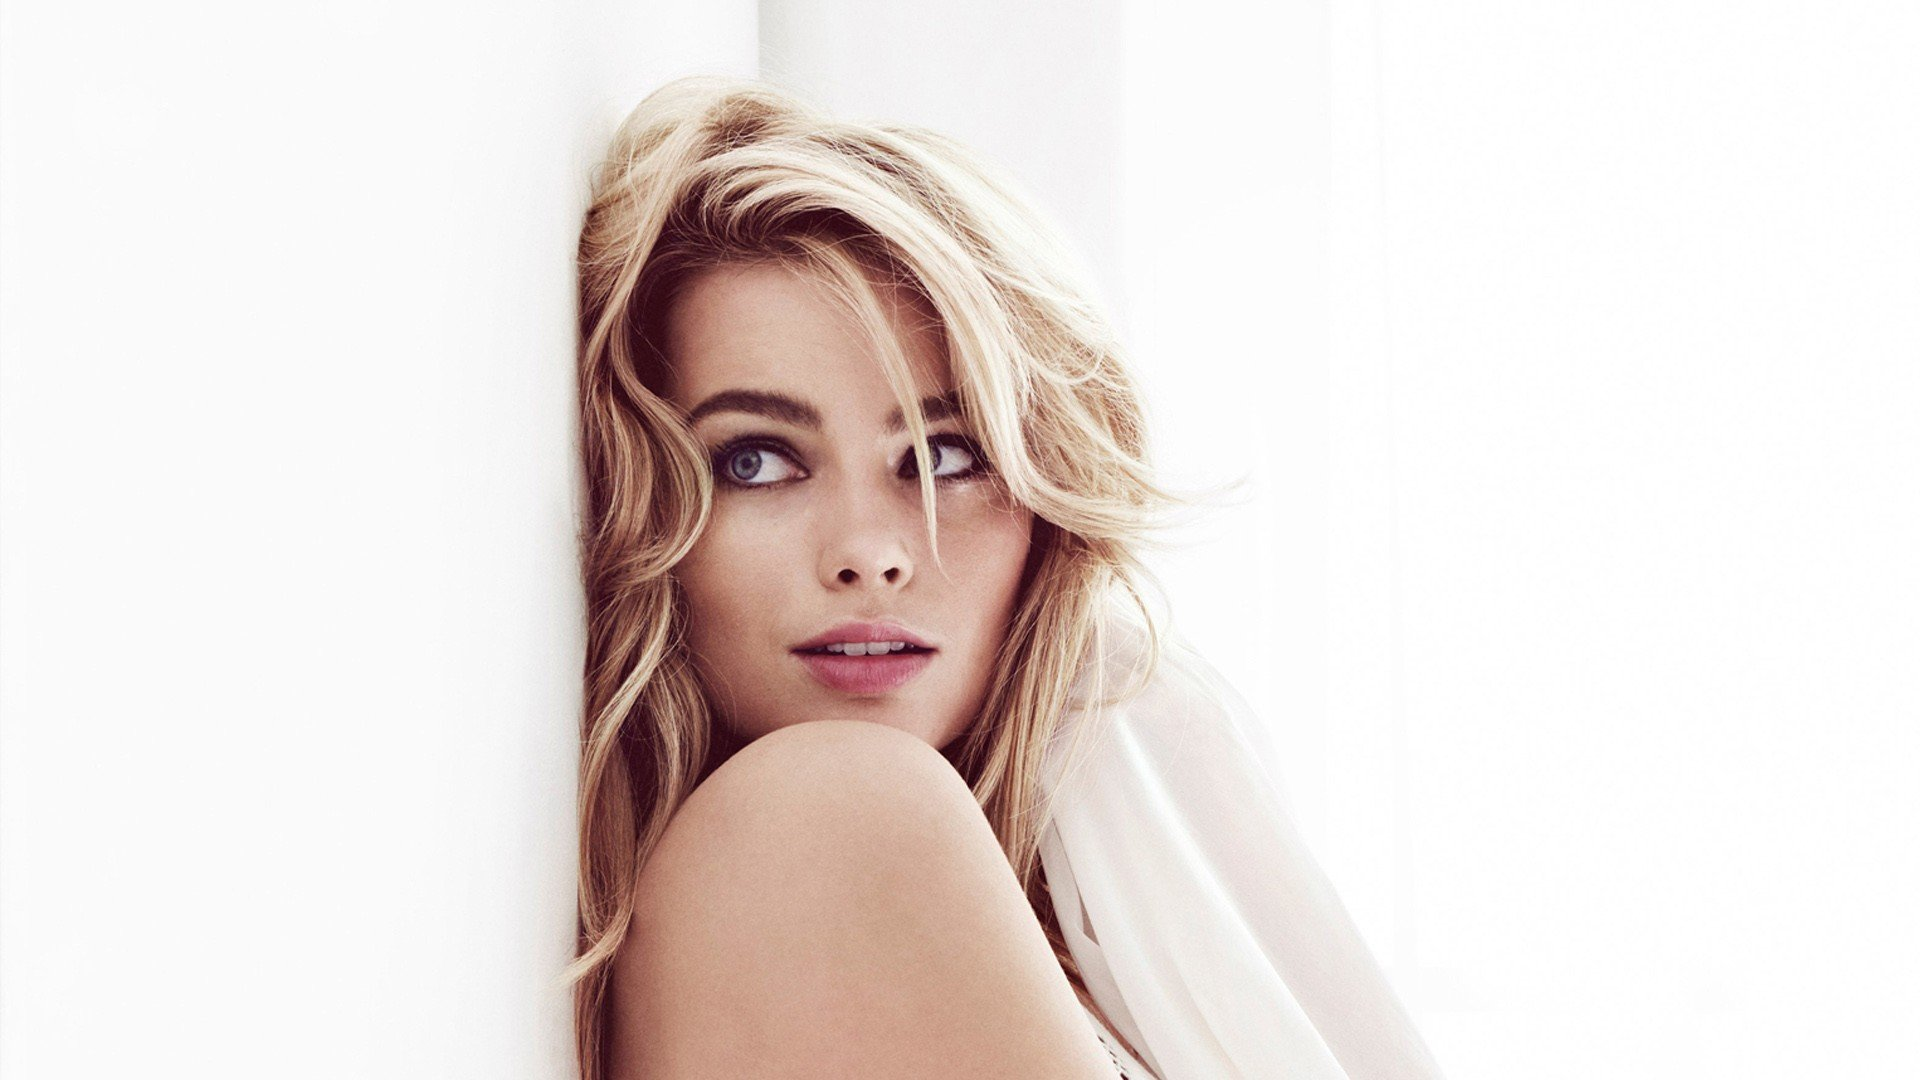 Margot Robbie Wallpapers Top Free Margot Robbie